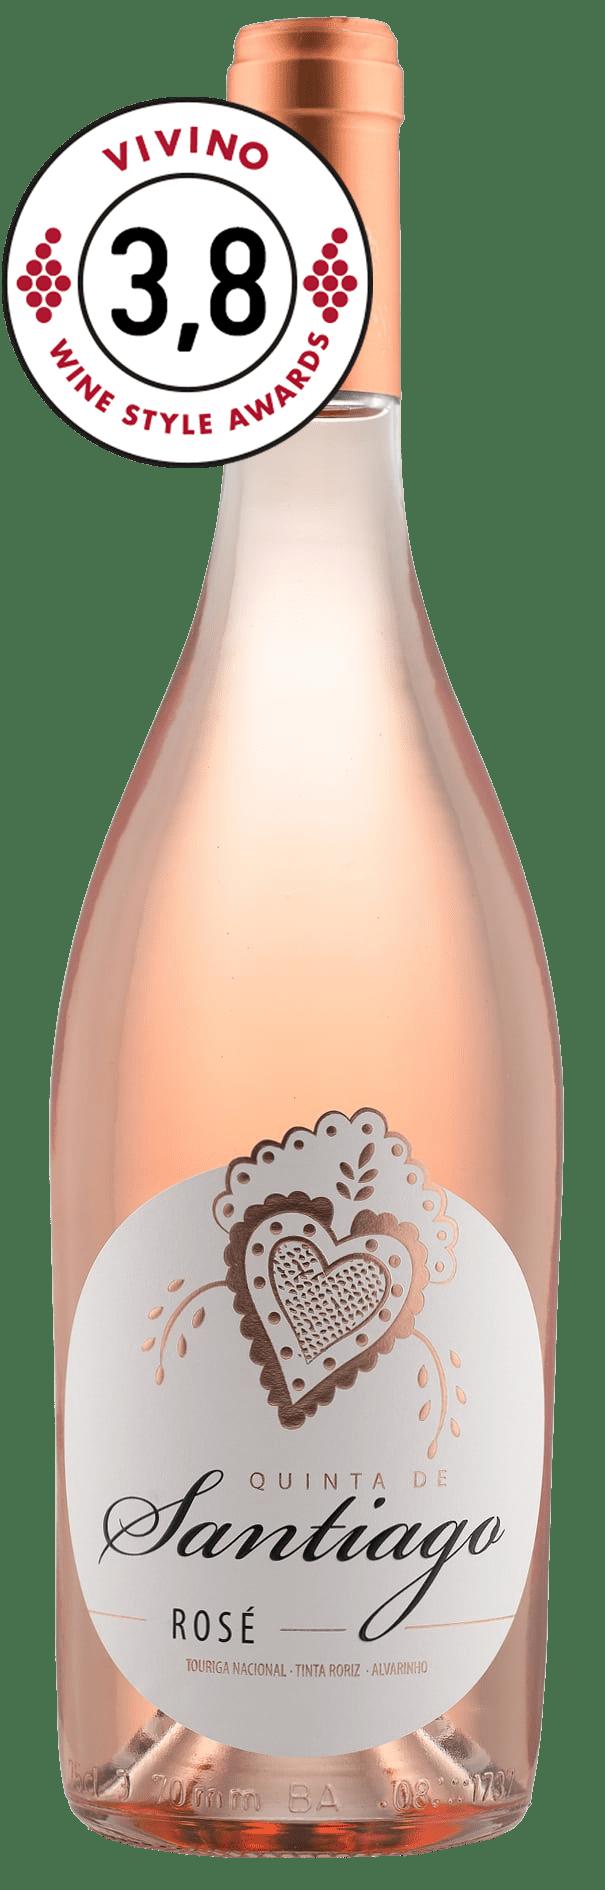 Quinta de Santiago Alvarinho Rosé 2017